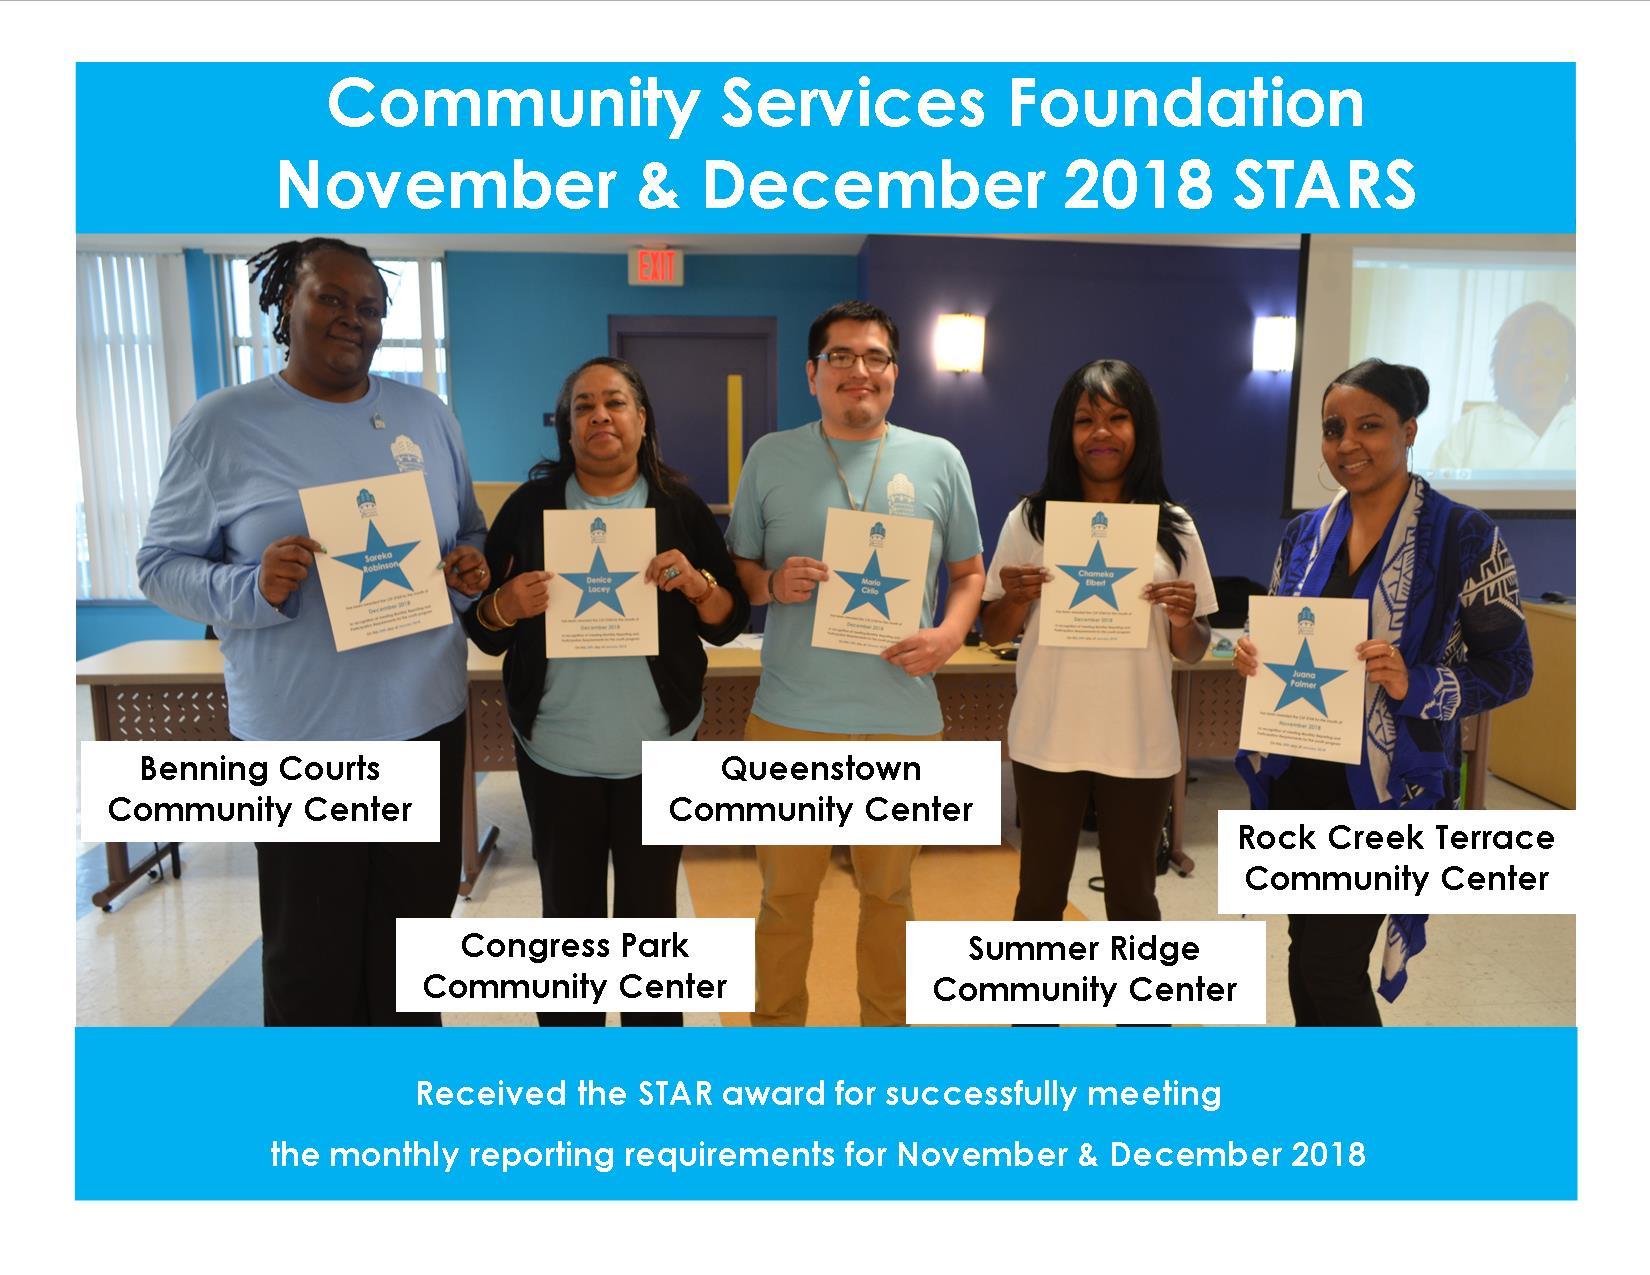 November and December 2018 Star